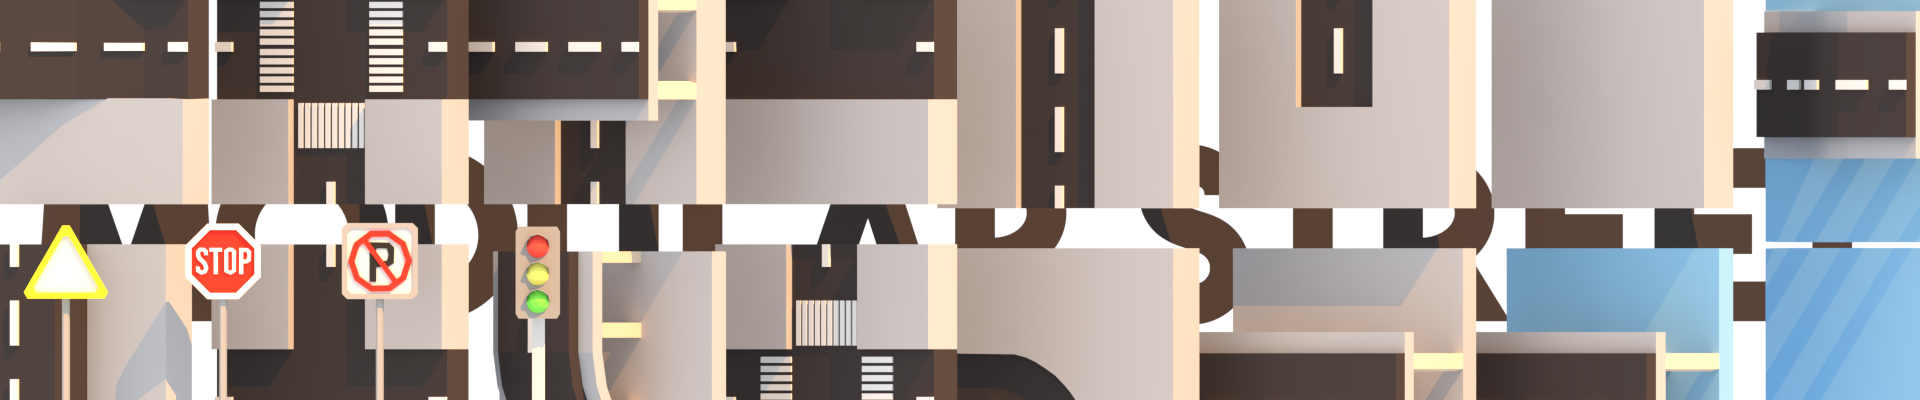 LowPoly Modular Street